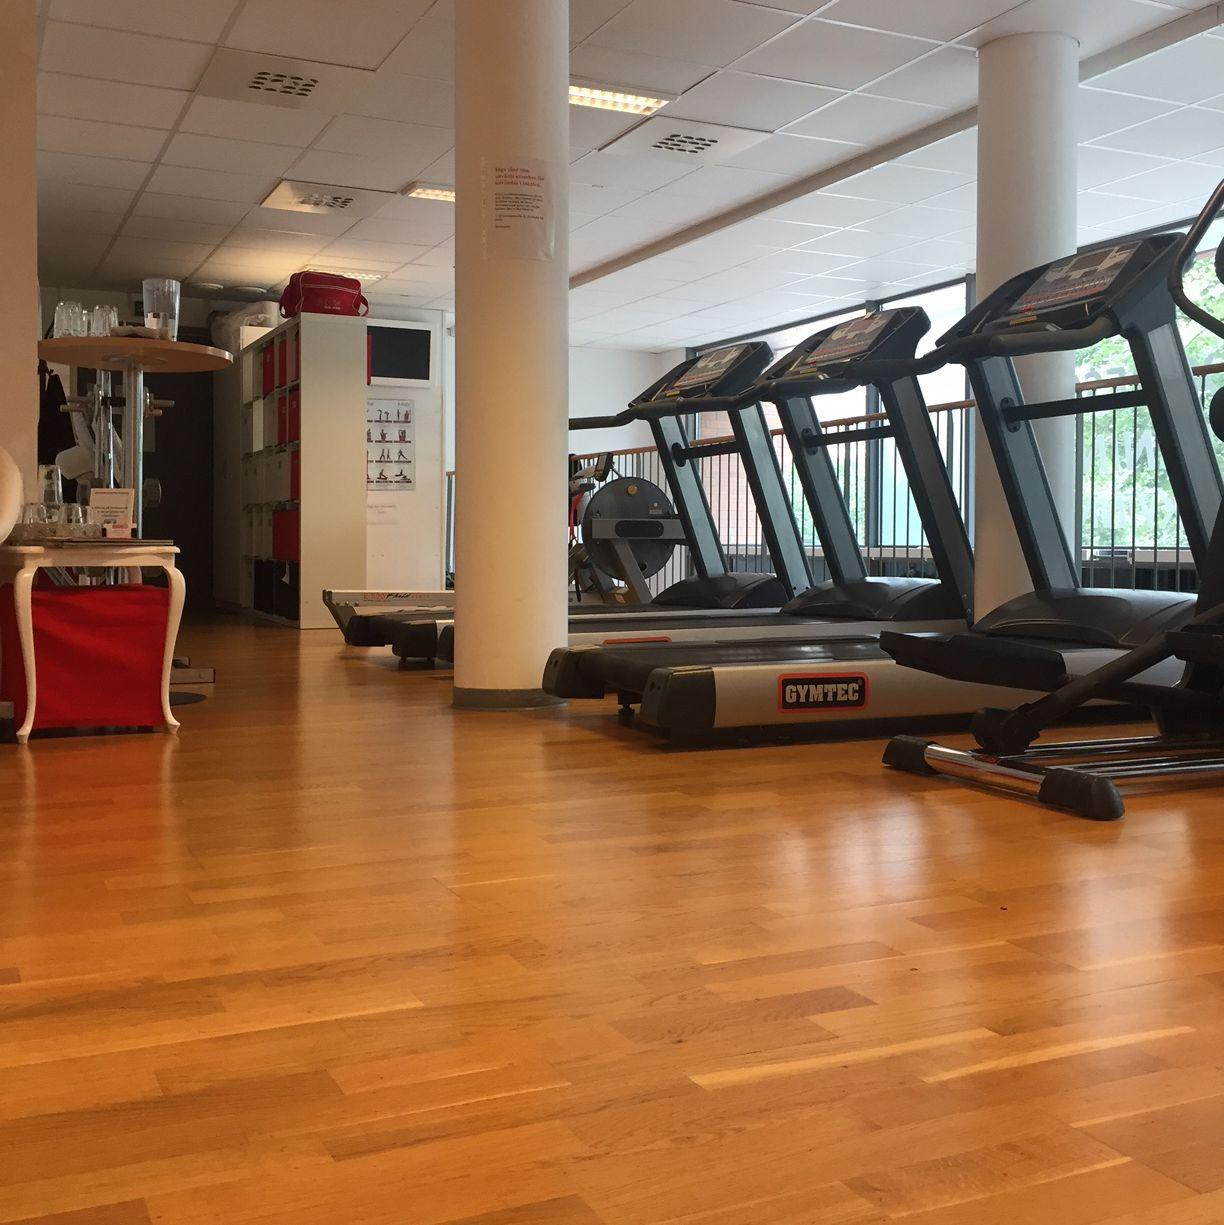 Massasje Damer Swingers I Norge